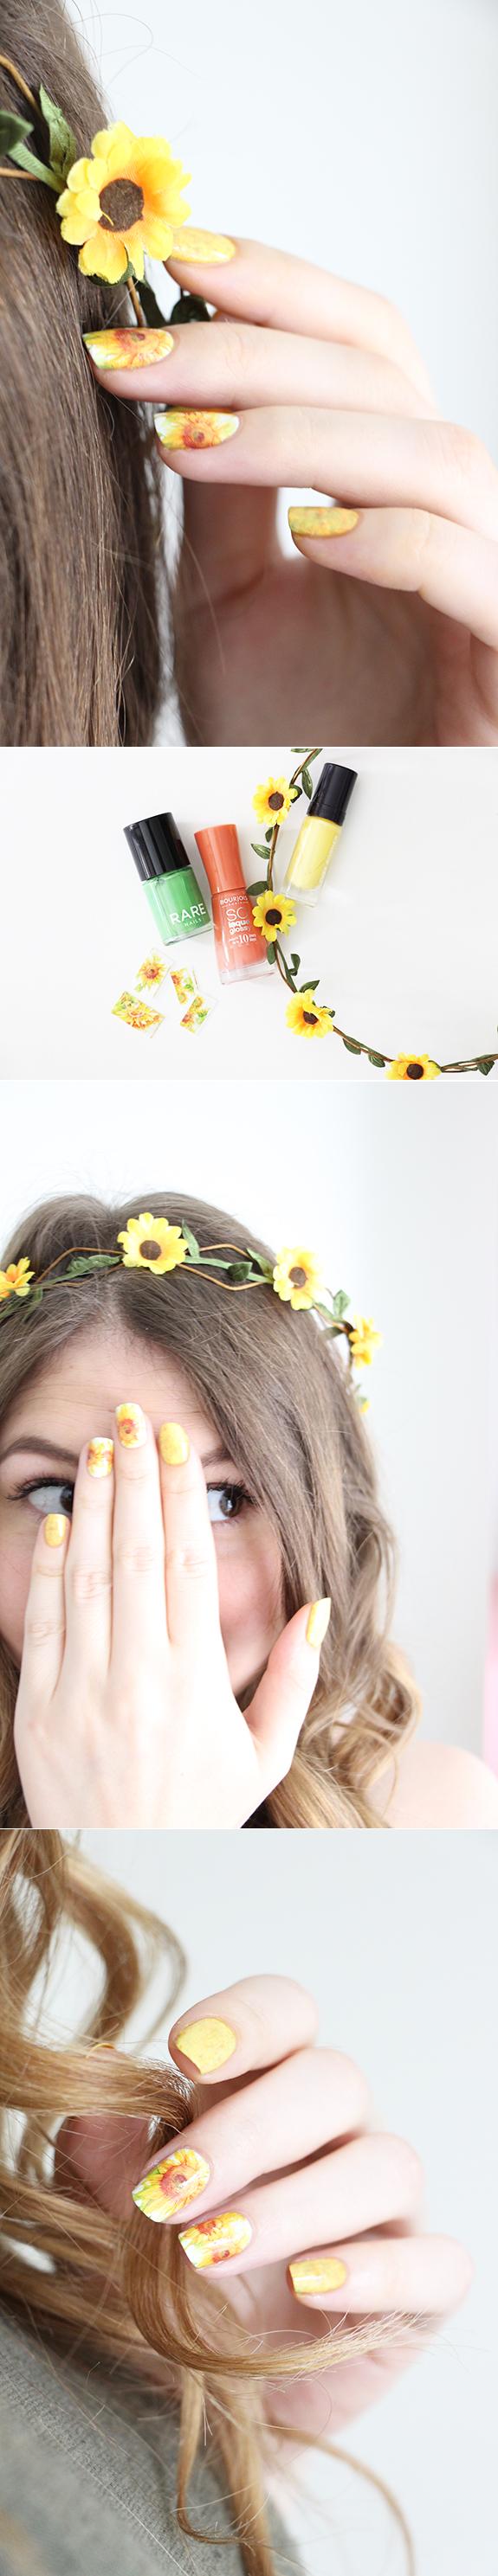 sunflower-nails-3